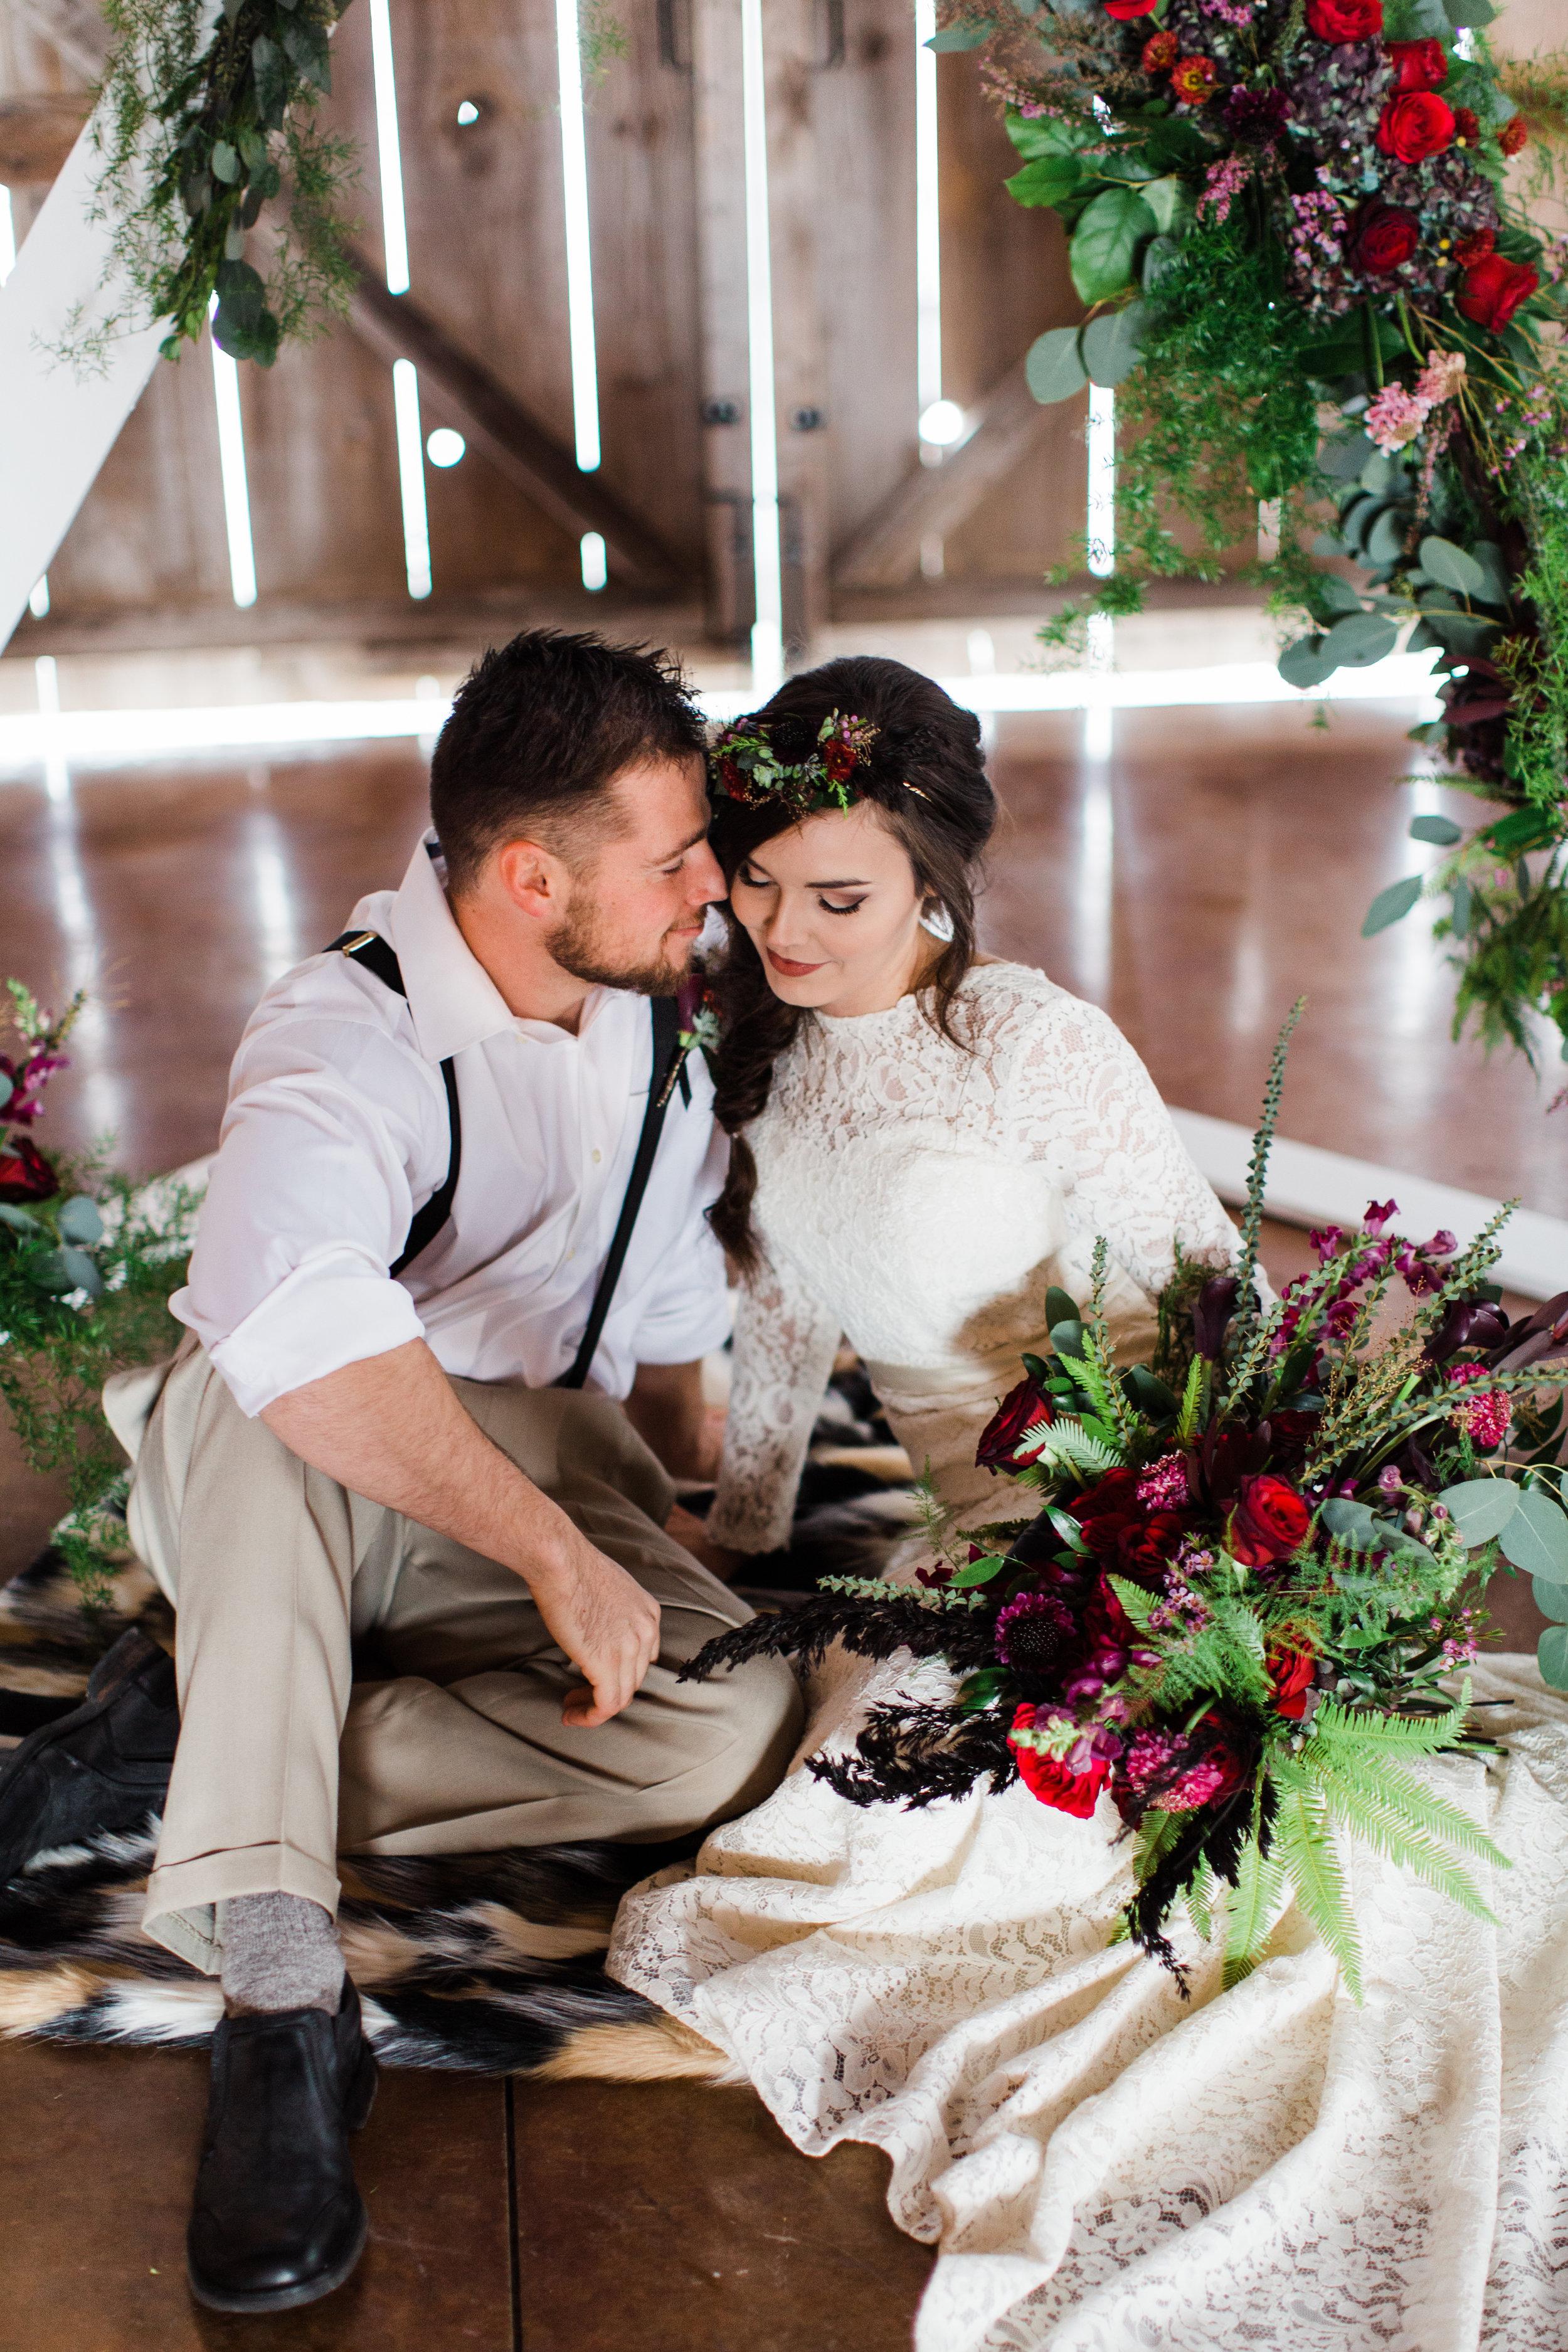 Heart + soul Johnson county wedding florist 15